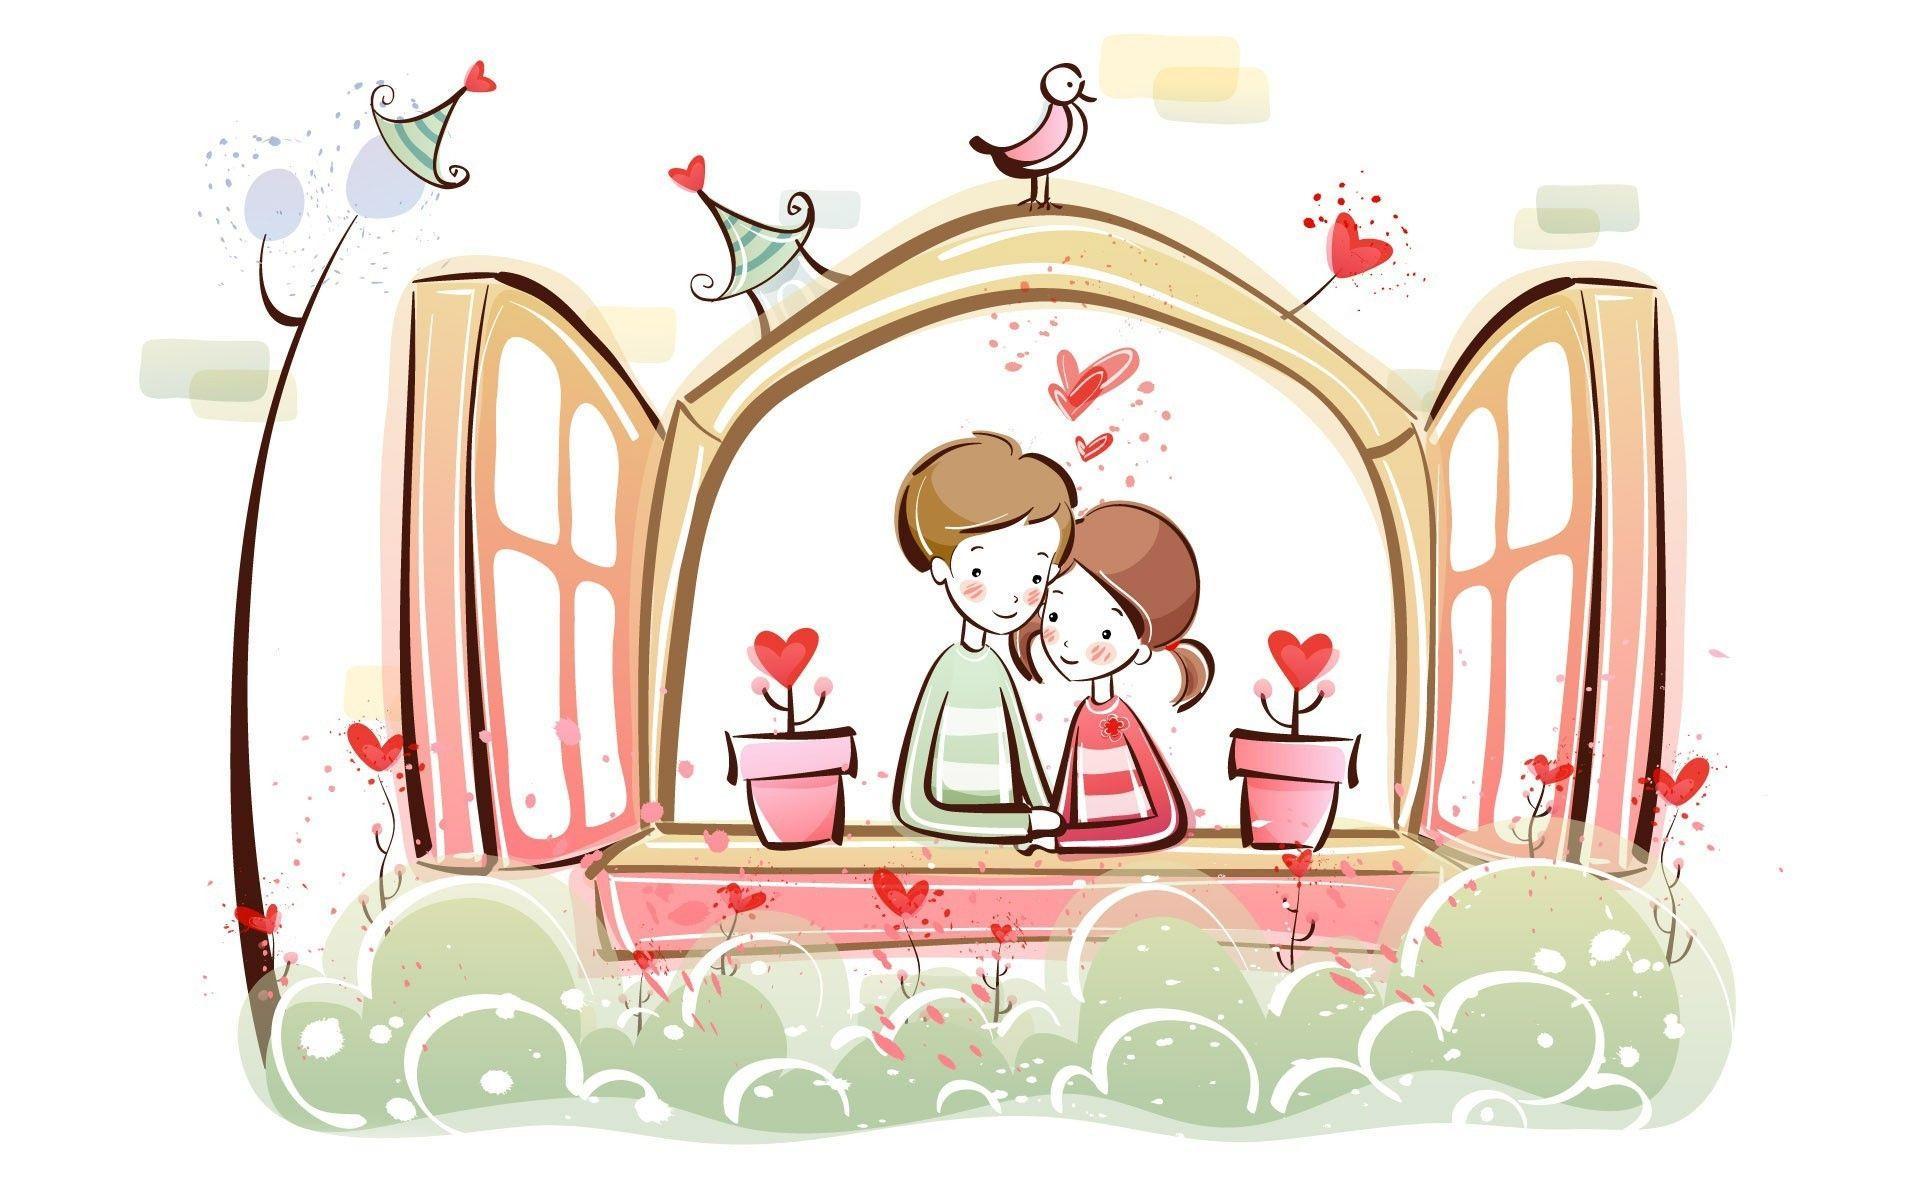 Love Cartoon Wallpapers Top Free Love Cartoon Backgrounds Wallpaperaccess